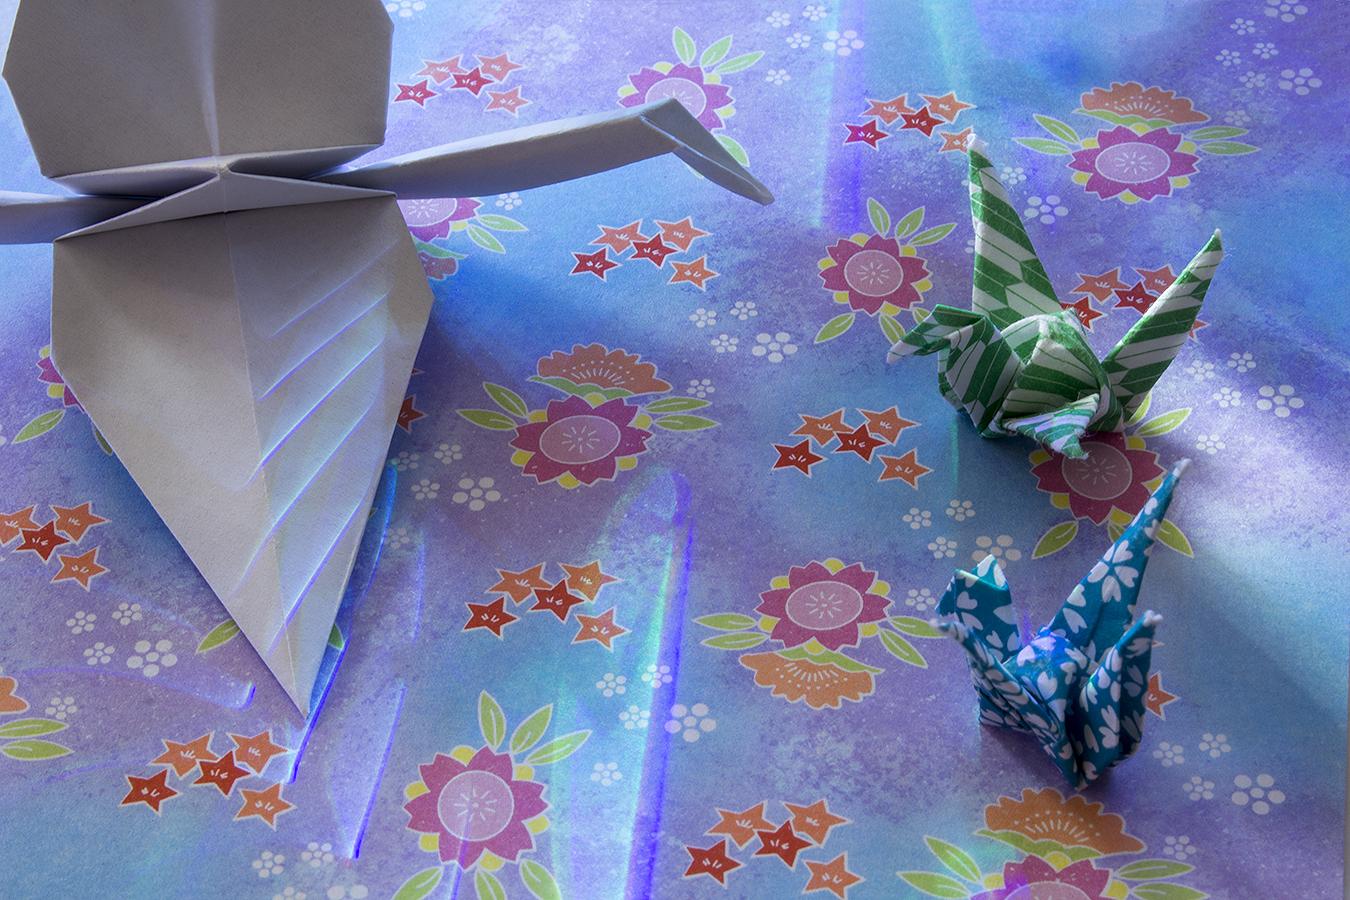 12_Feathers_Jonathan_Tang_UPenn_Tony_Ward_Studio_Crane_Long_Exposure_Low_Light_LED_Optics_Origami_Paper